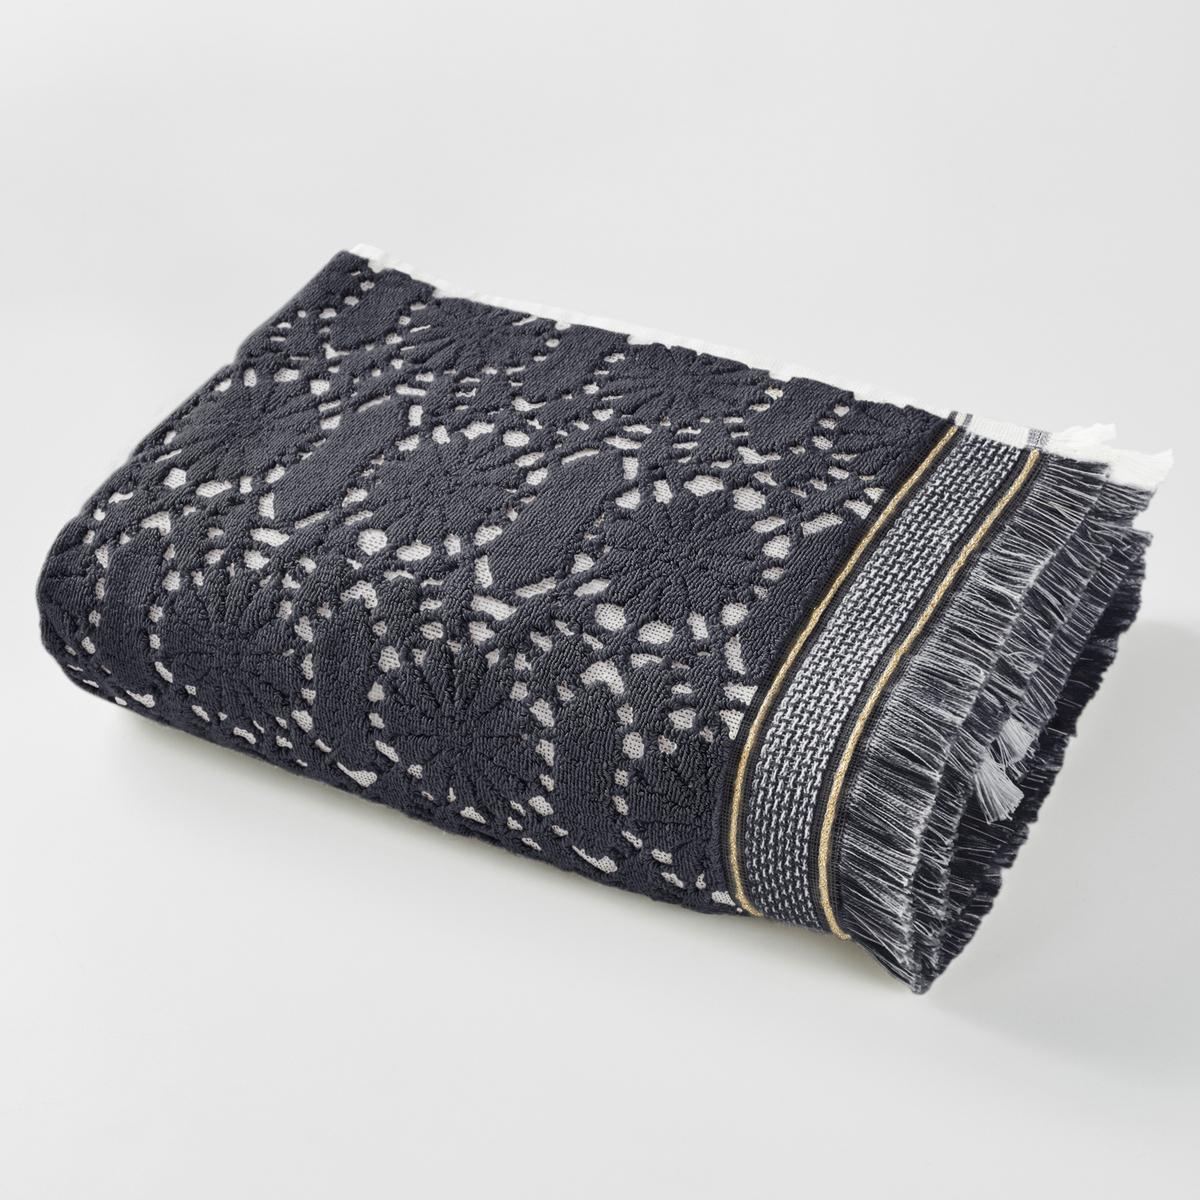 Полотенце банное махровое 500г/м² PURDY полотенца банные aisha махровое полотенце бежевый 40 70 100